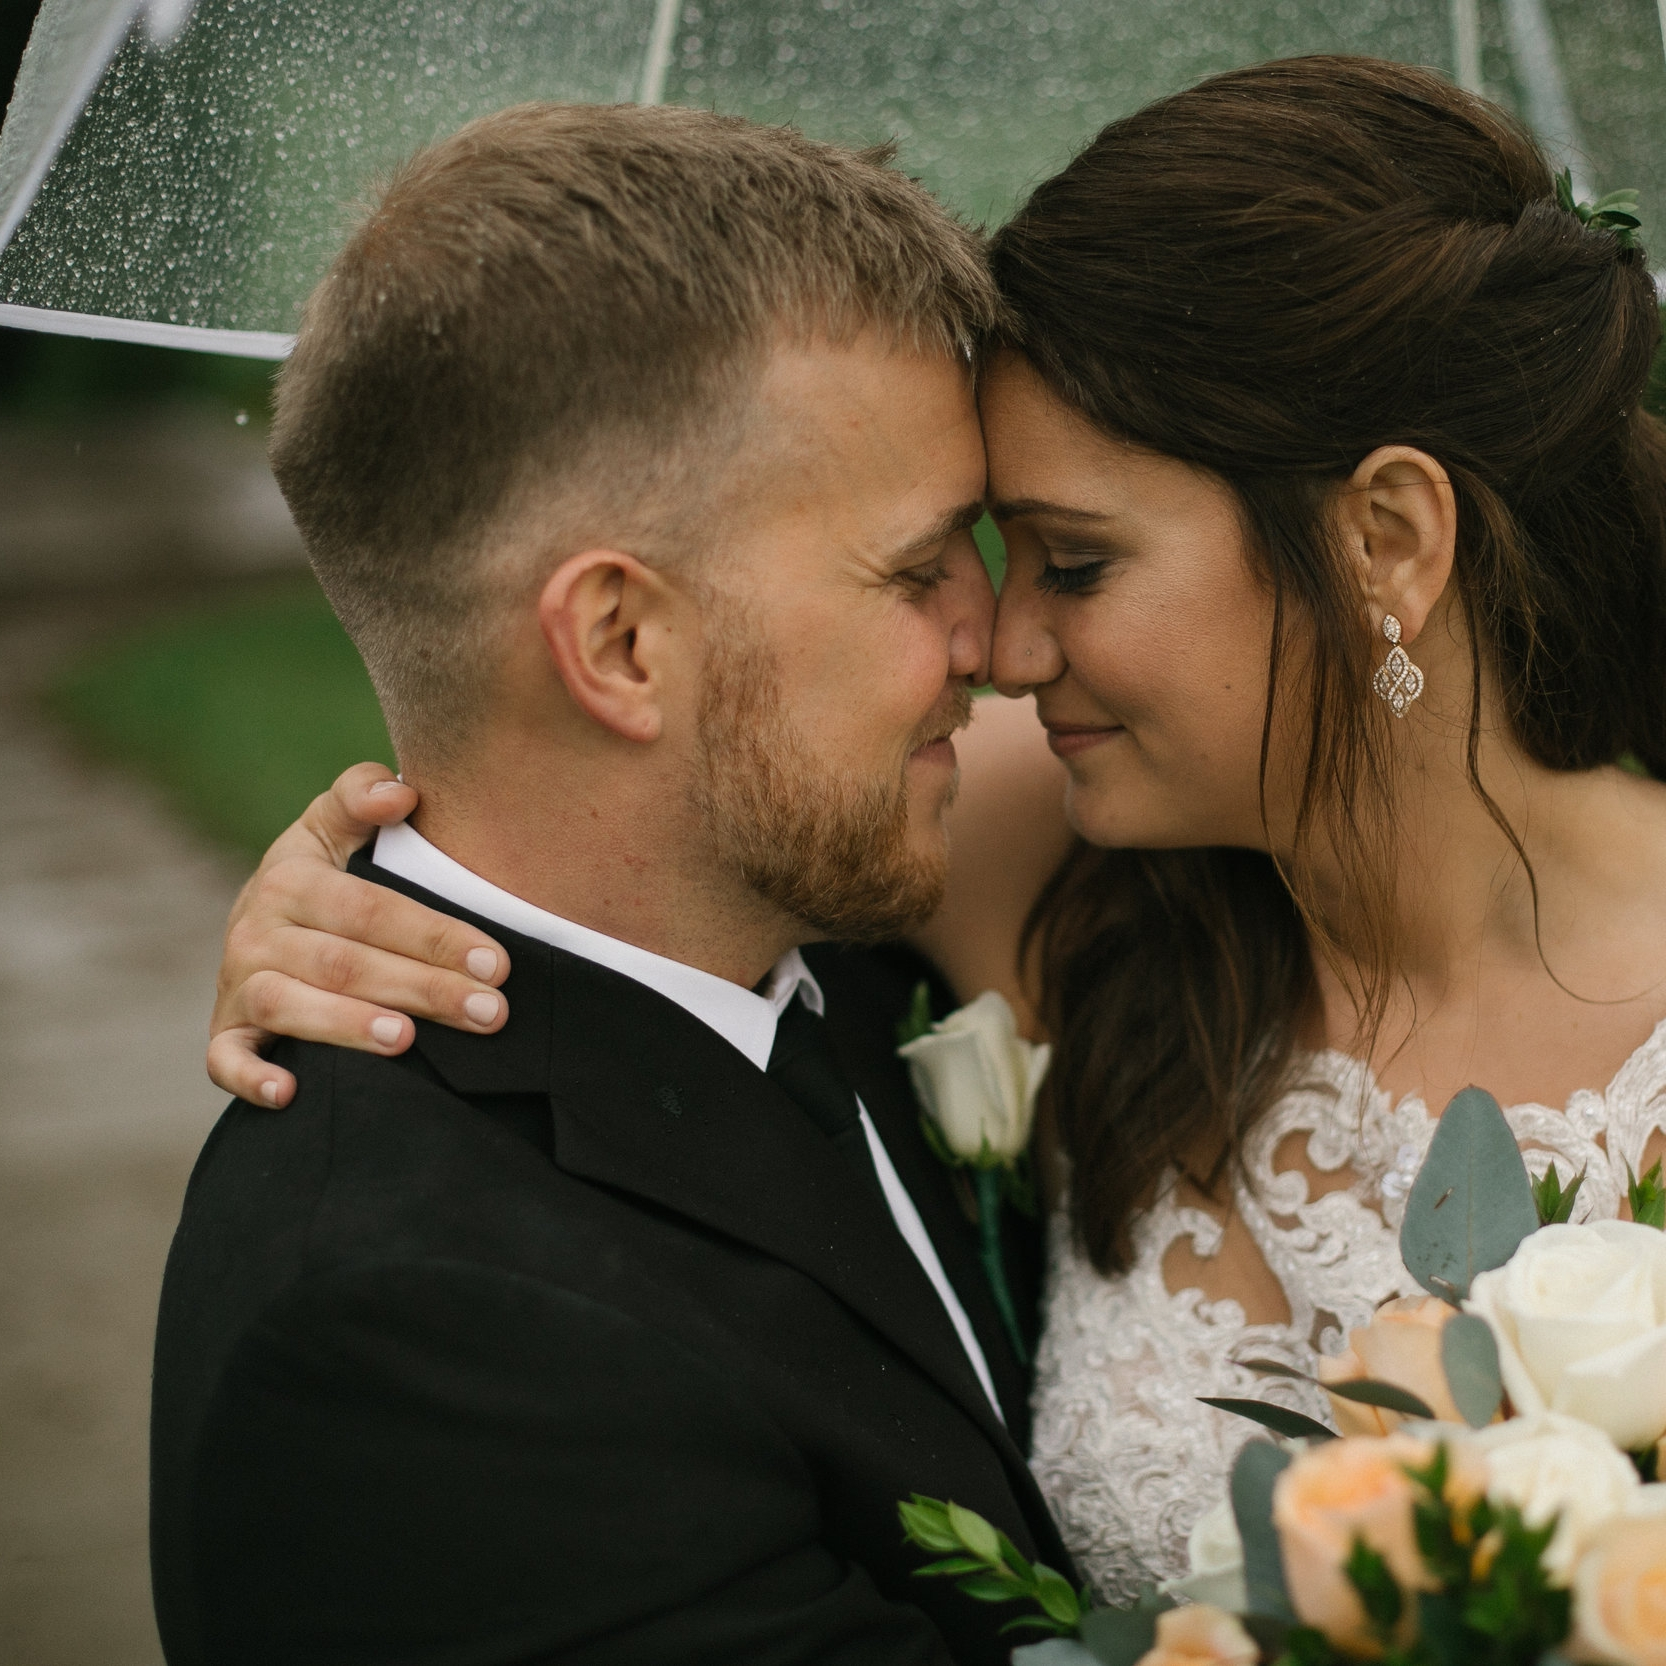 2018.05.05_SarahDillon_Wedding_Starks-0048.jpg